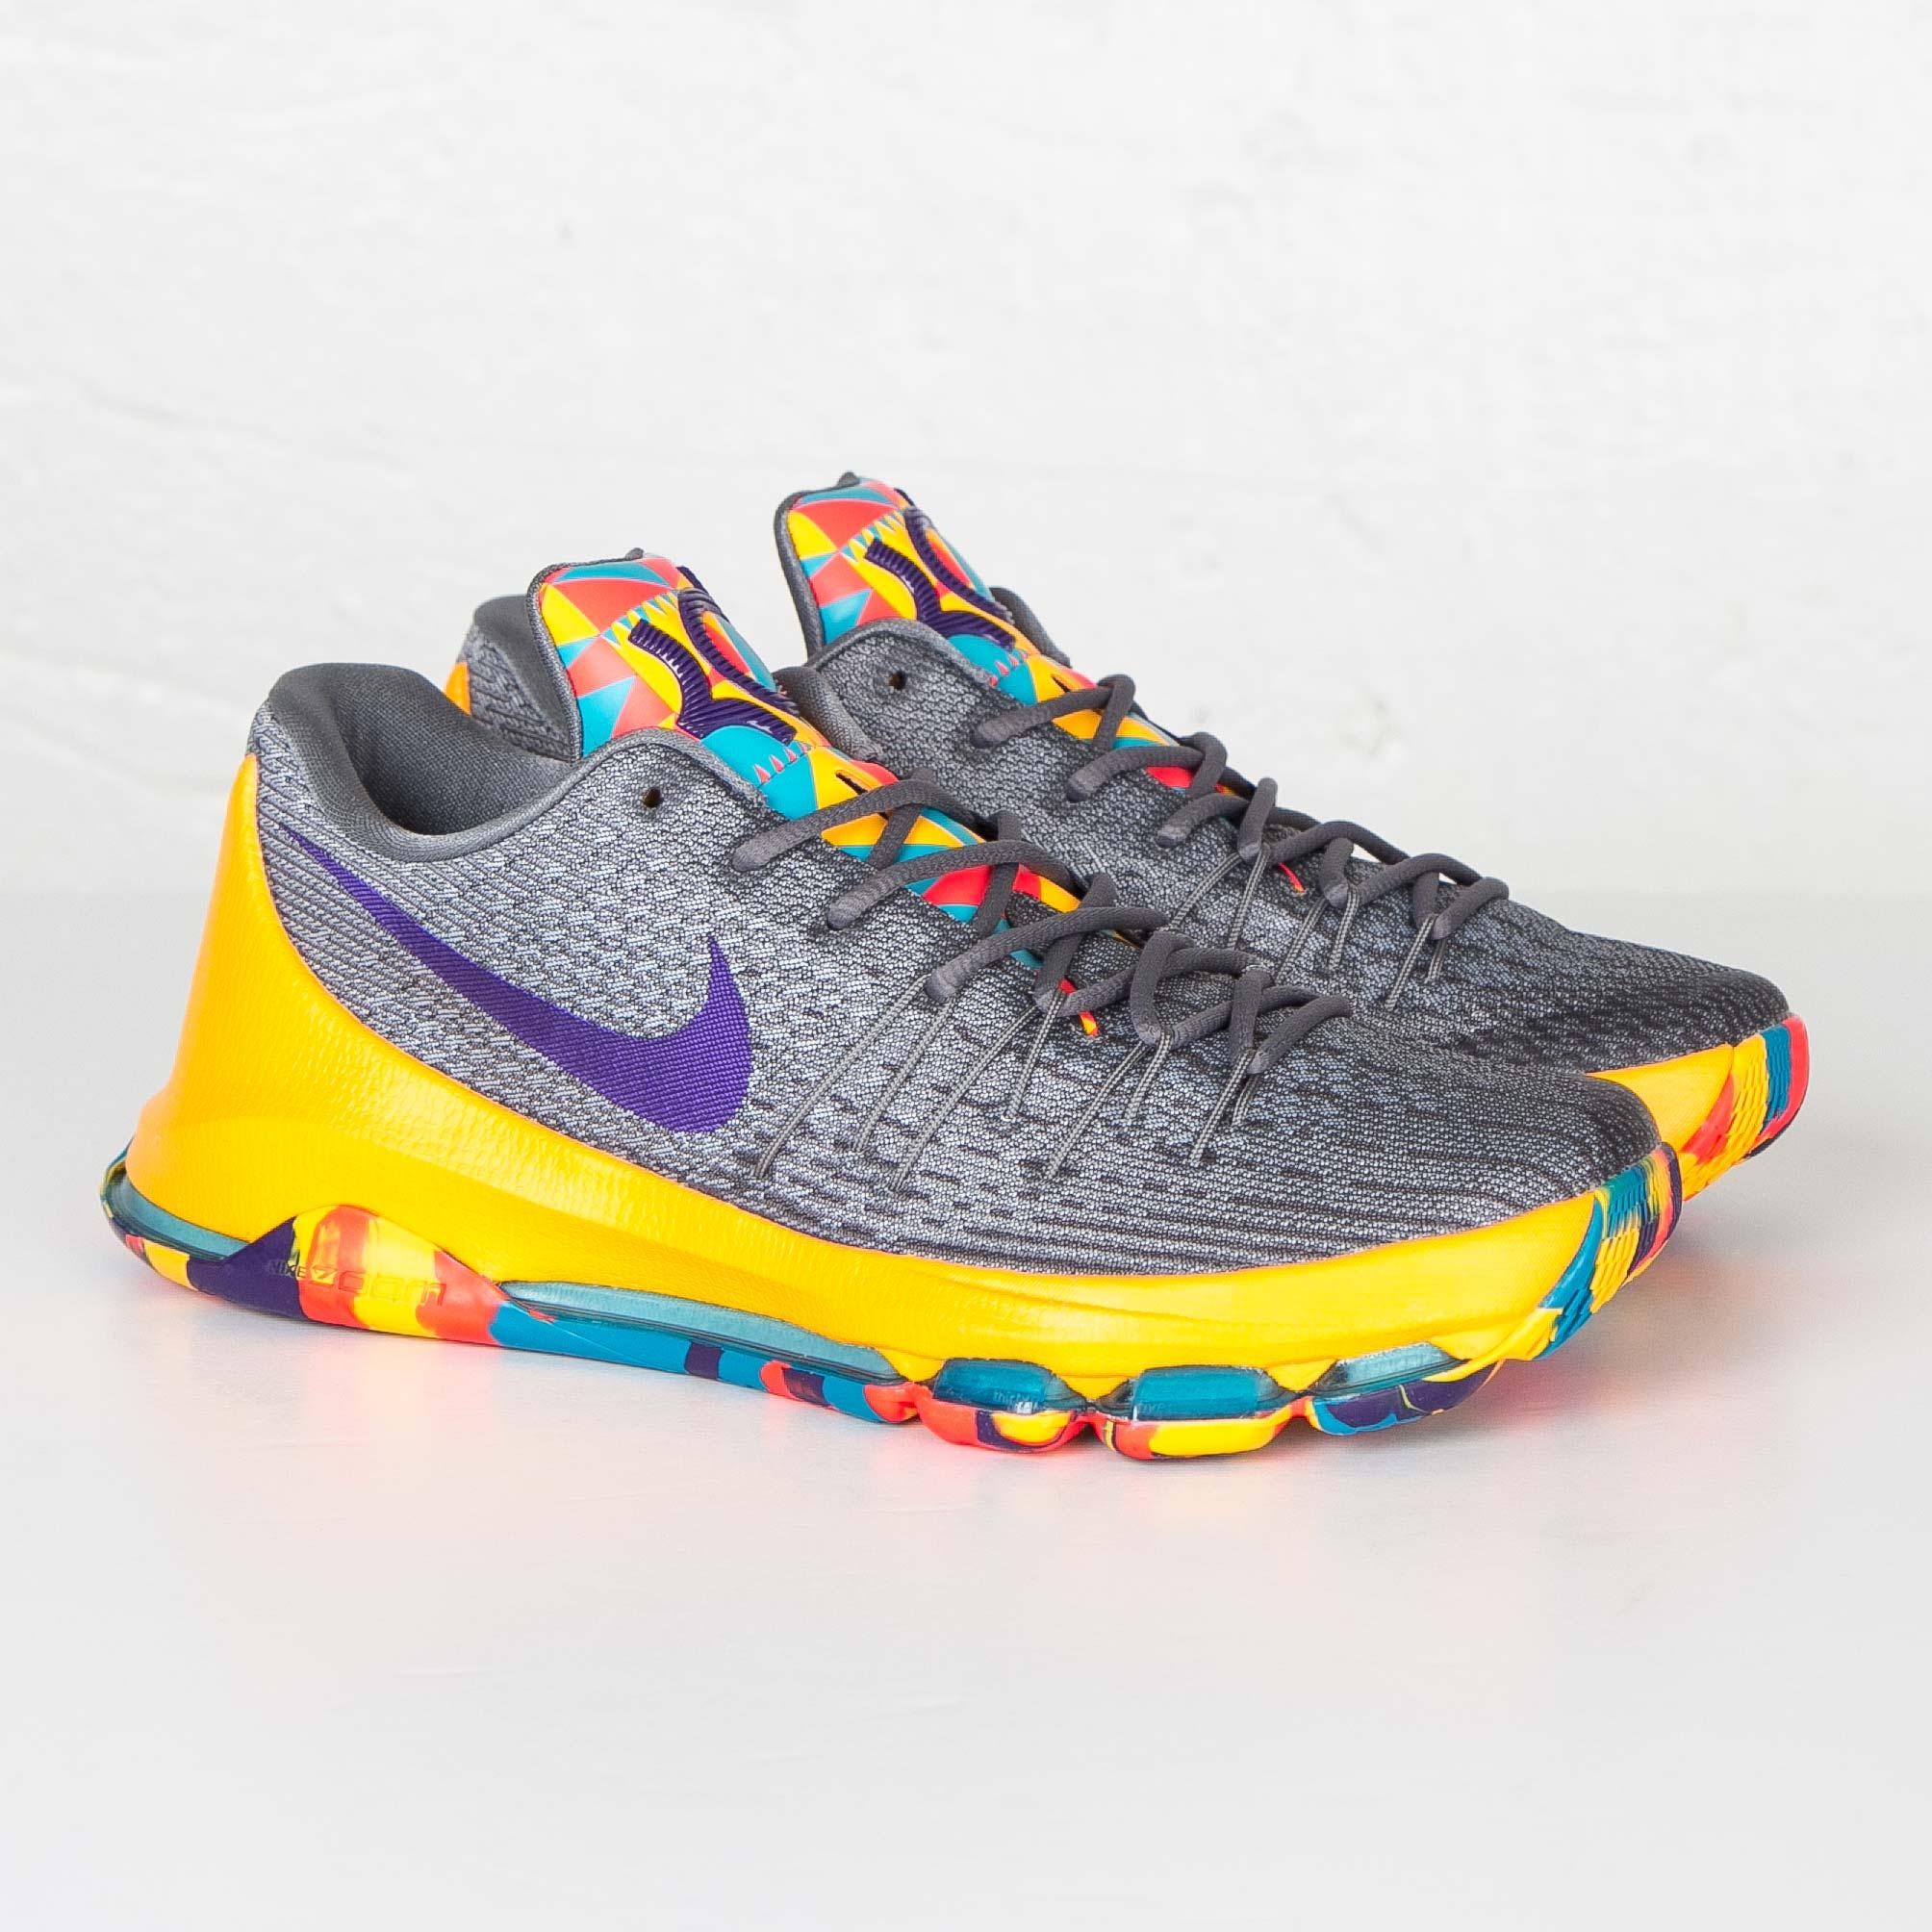 3a2f0bab4ebb ... real nike kd 8 749375 050 sneakersnstuff sneakers streetwear 6efc8 b554d